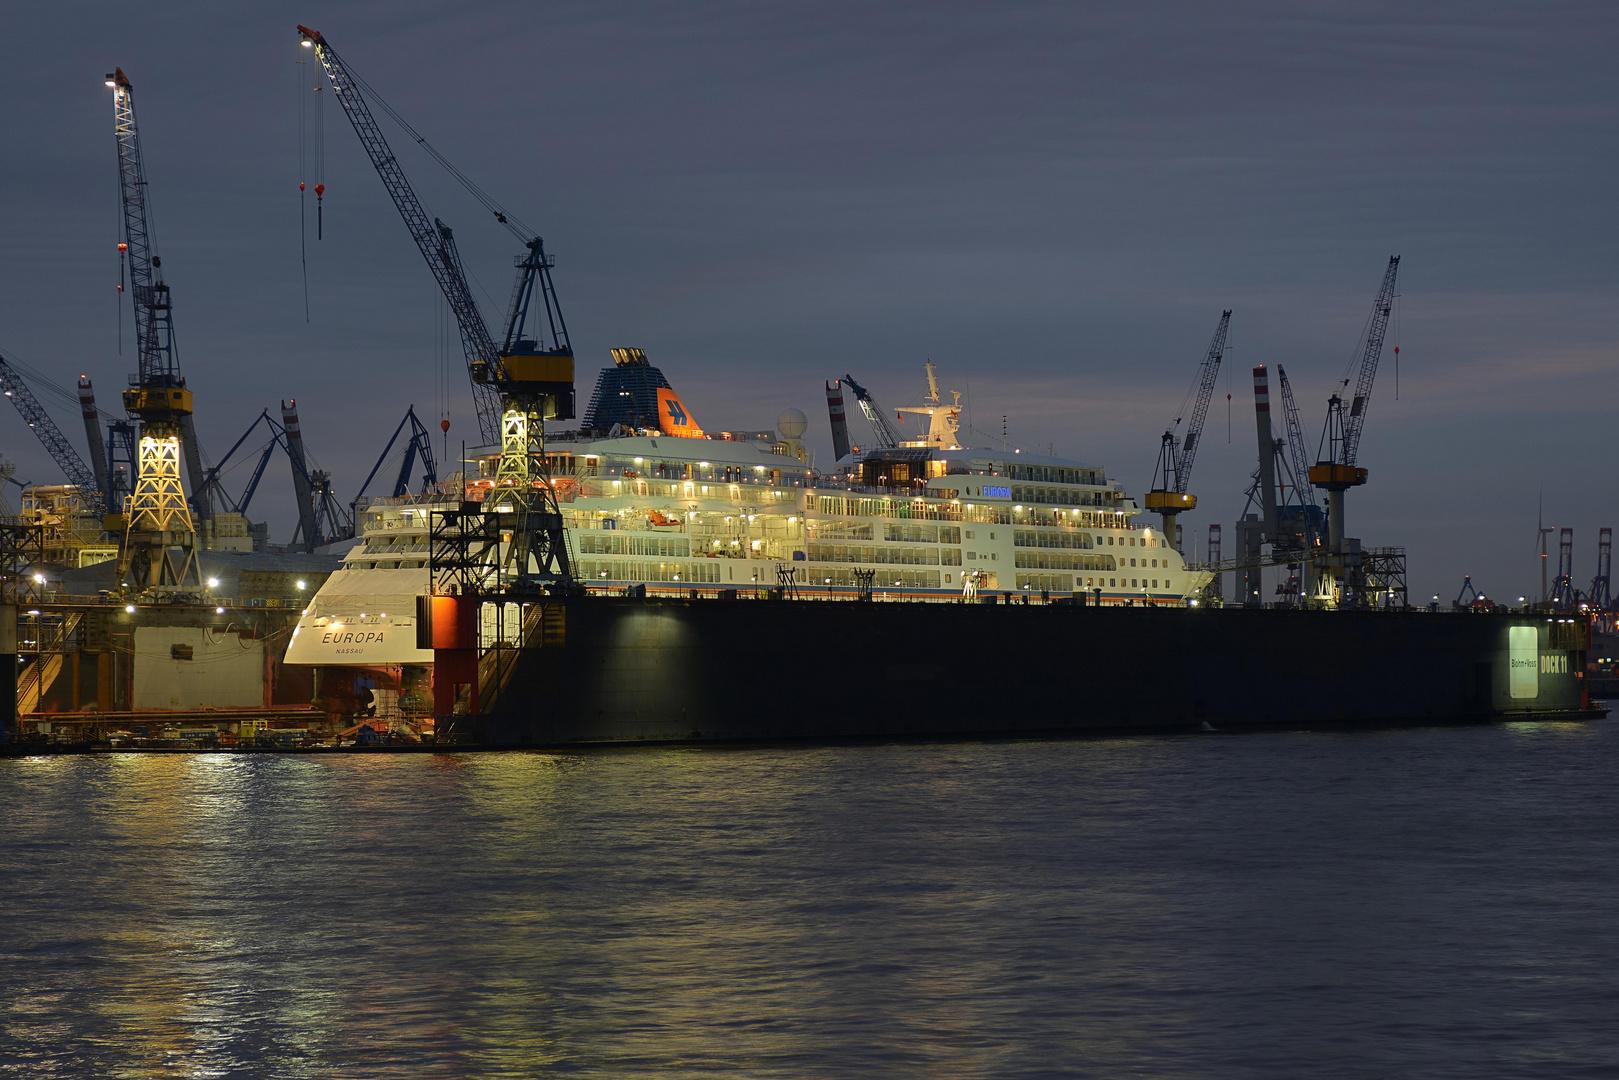 MS Europa at Blohm+Voss in Hamburg